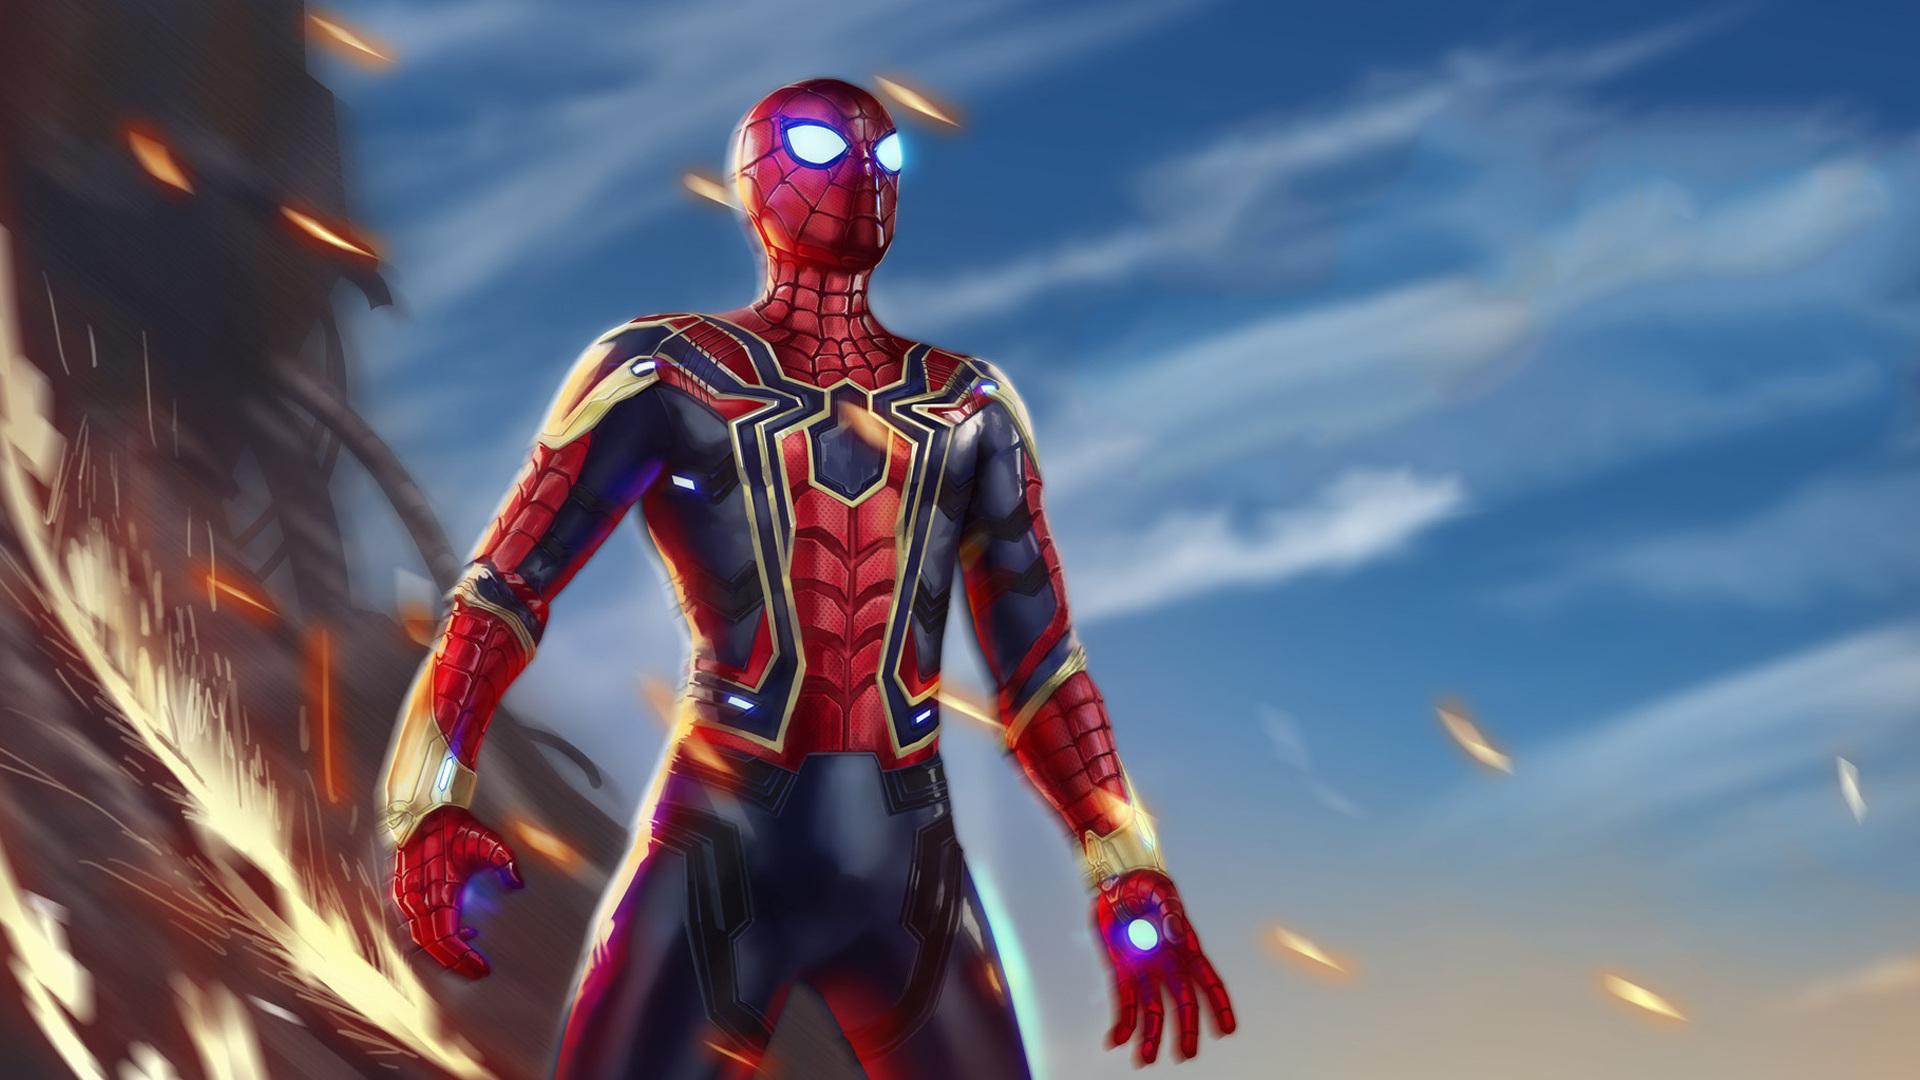 1920x1080 iron spiderman avengers infiniy war laptop full - Iron man spiderman wallpaper ...